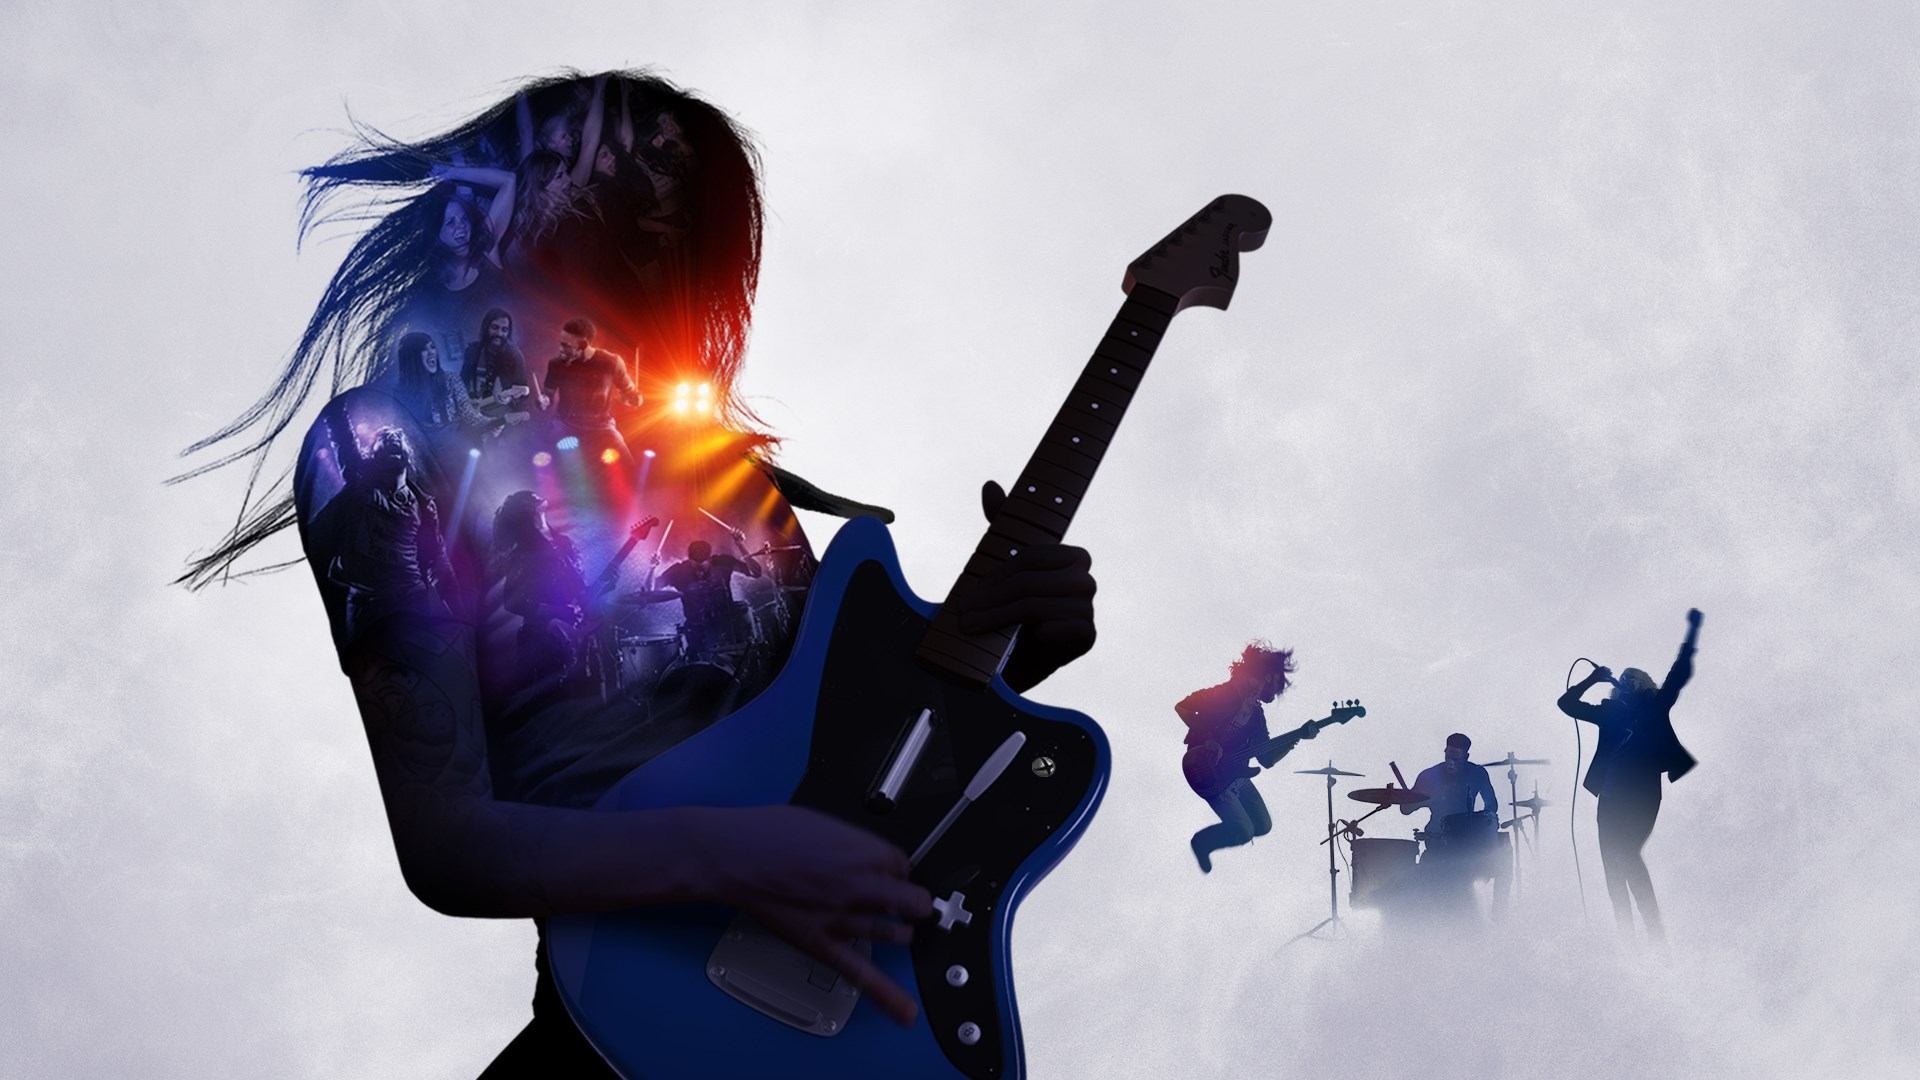 Buy Rock Band 4 - Microsoft Store